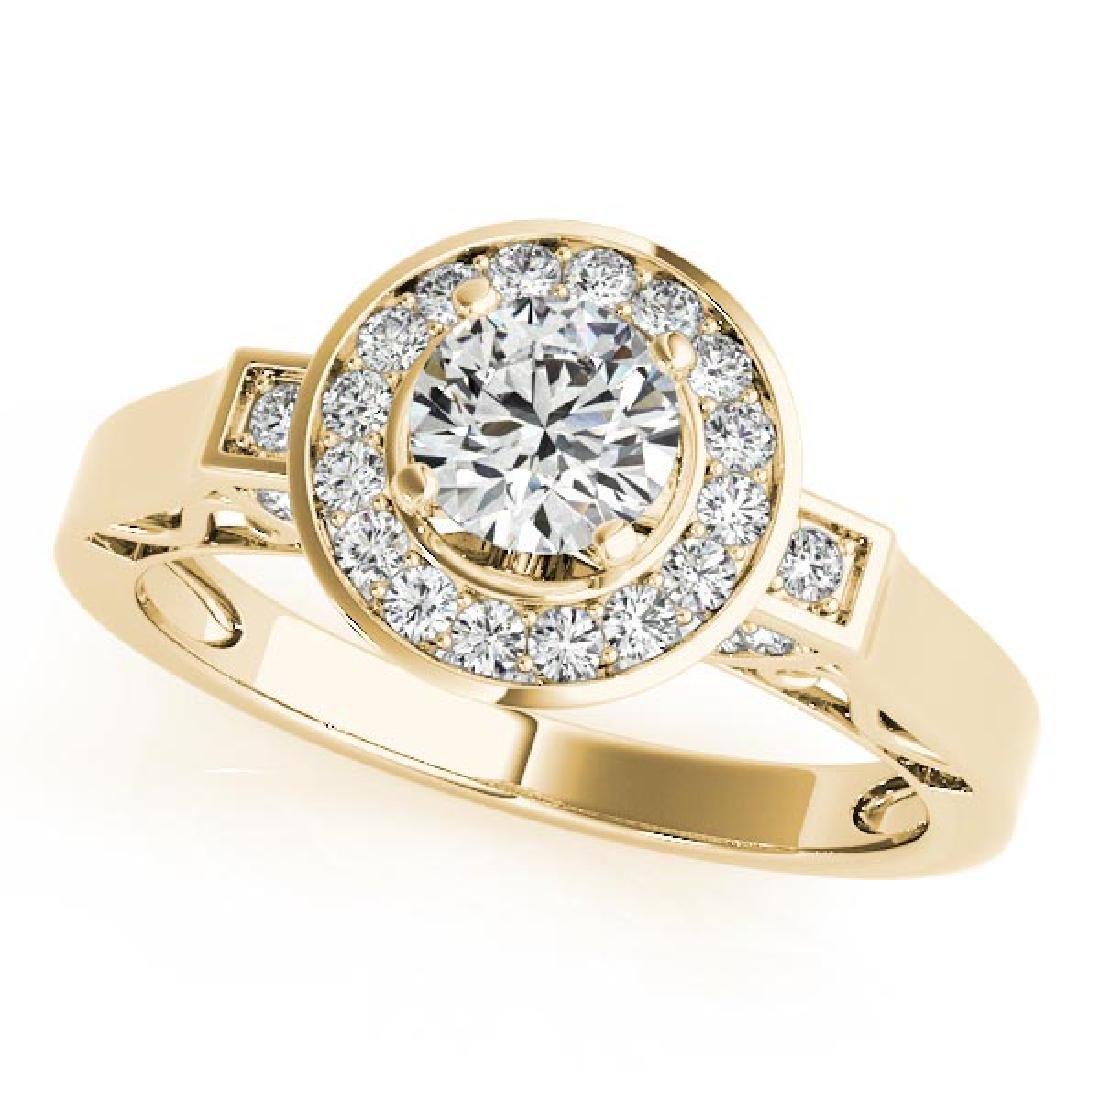 CERTIFIED 18K YELLOW GOLD 0.97 CT G-H/VS-SI1 DIAMOND HA